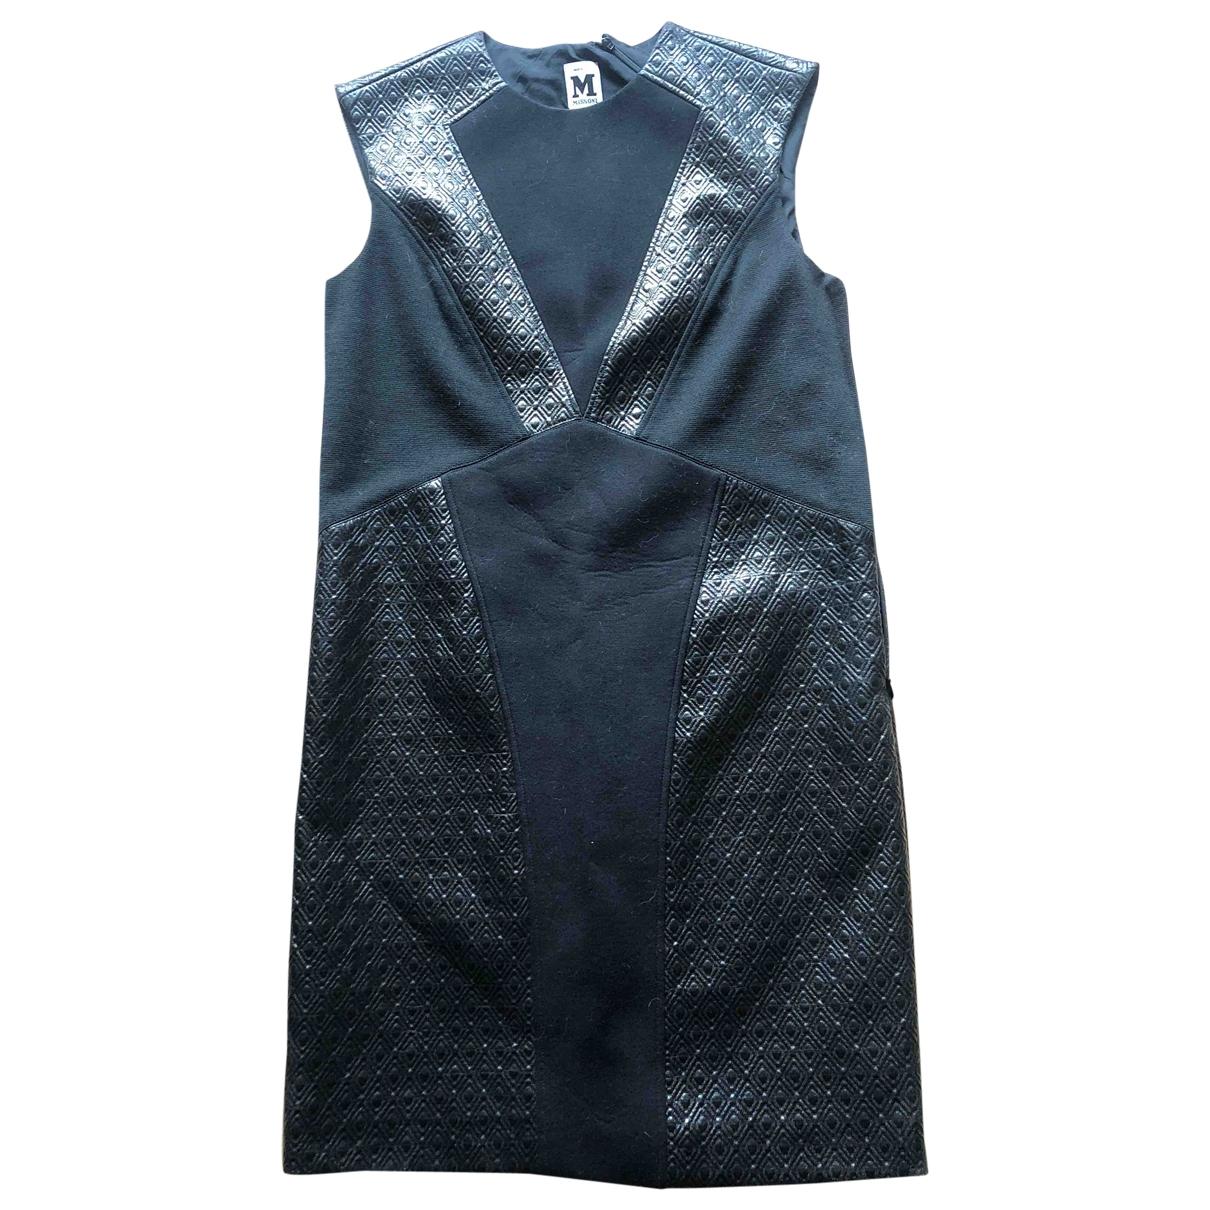 M Missoni \N Black dress for Women 40 IT